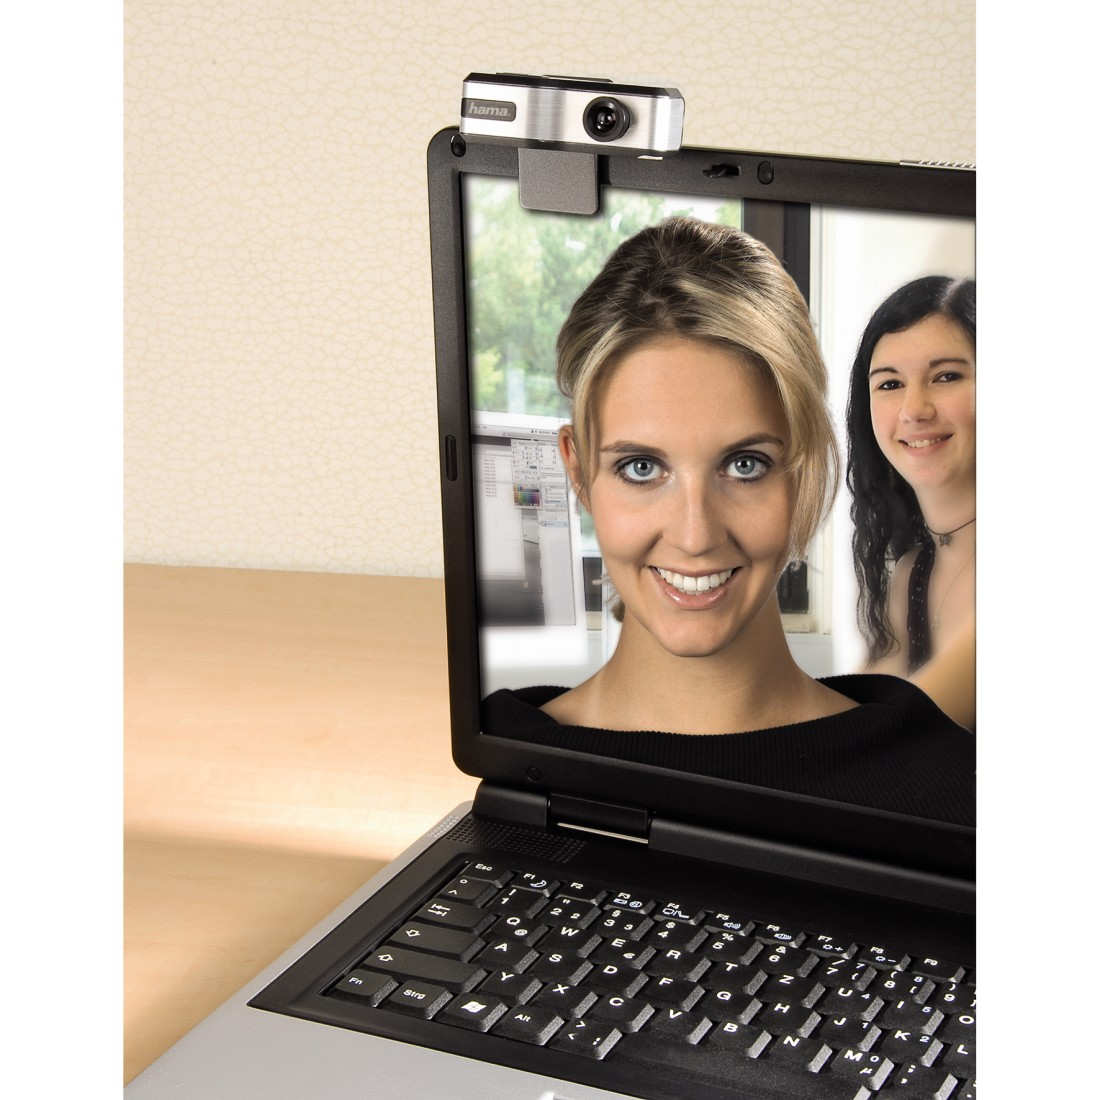 HAMA Messenger Set II PC Webcam/Headset Driver UPDATE